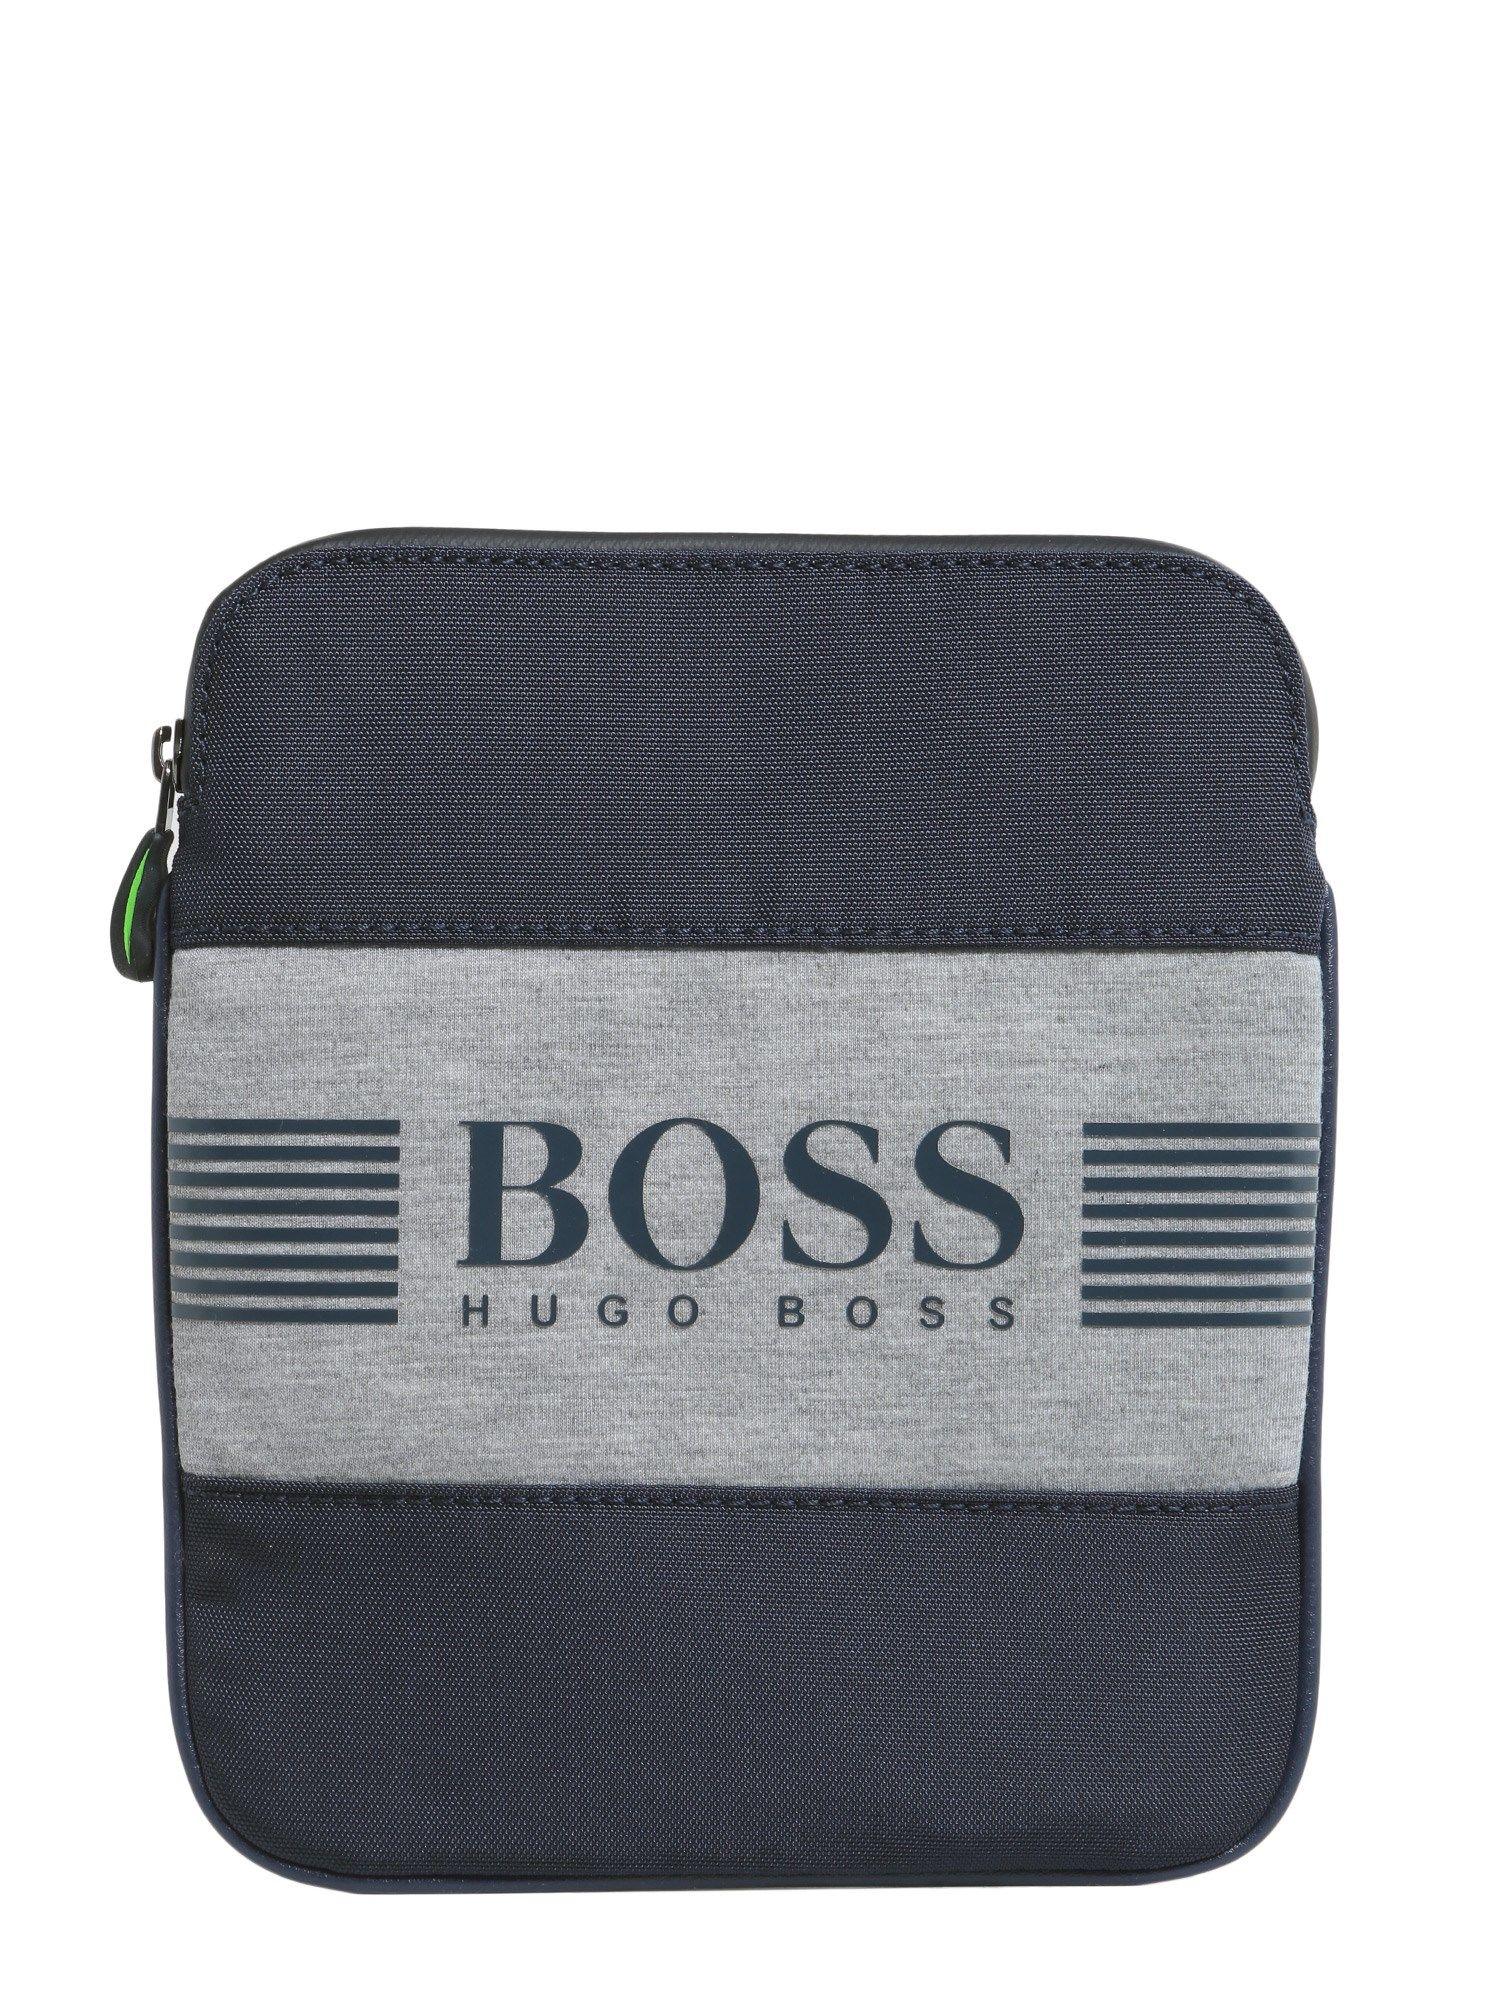 Pixel Crossbody Bag